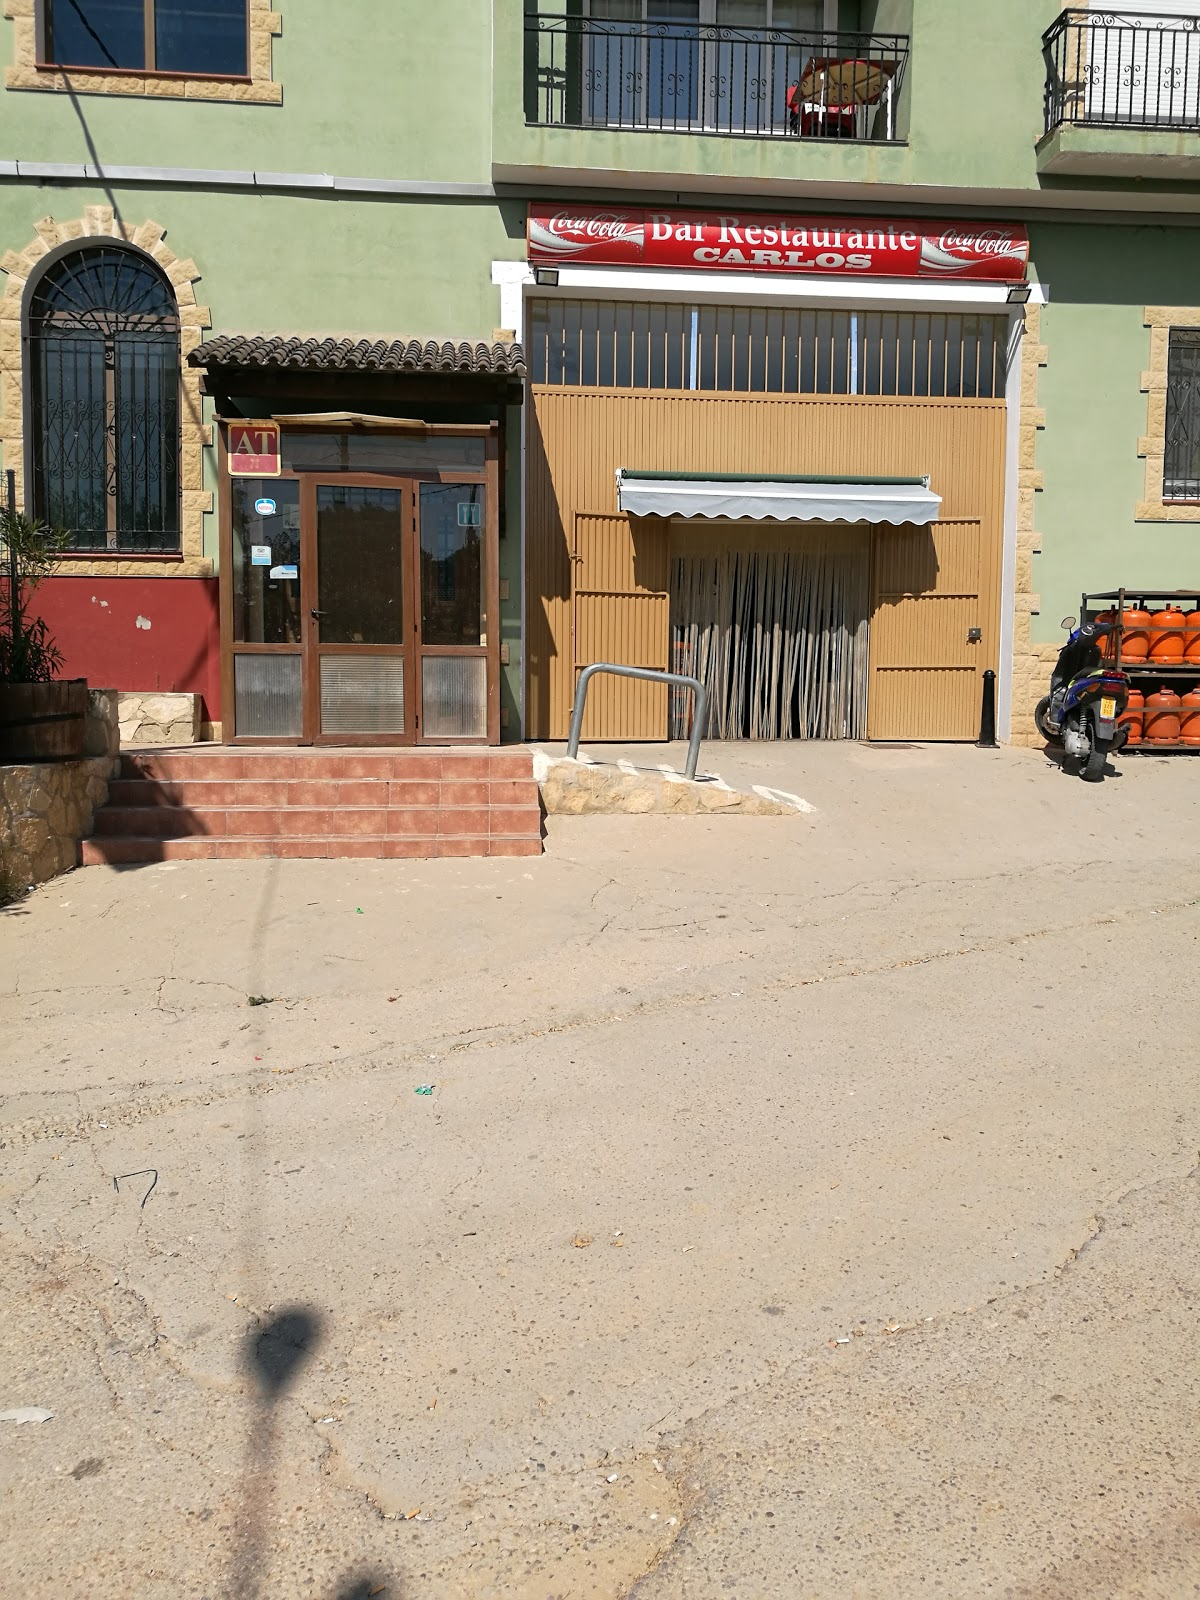 Bar restaurante Carlos